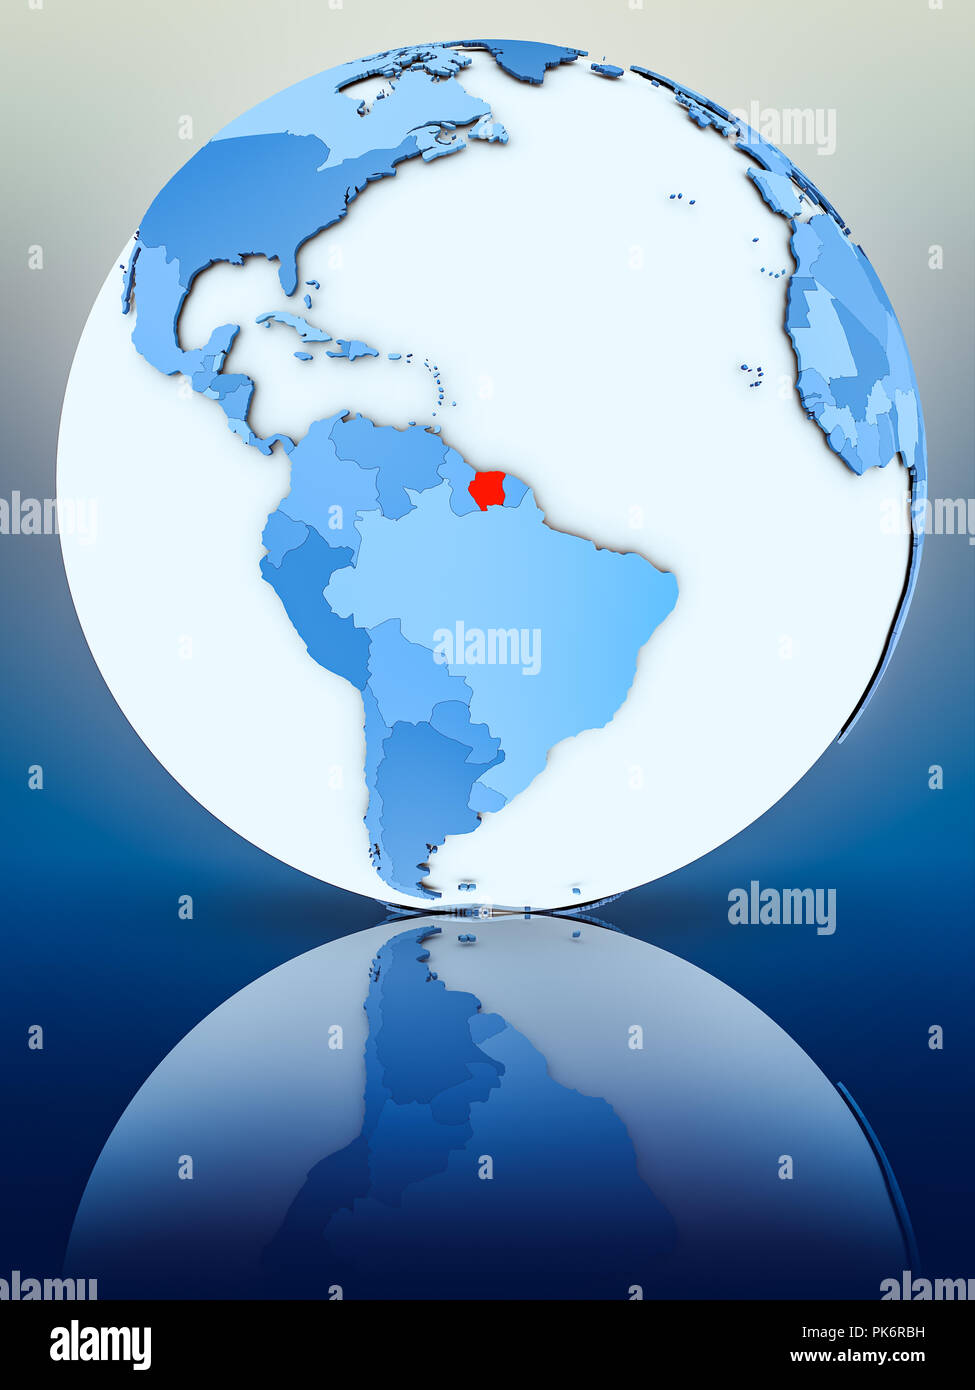 Suriname on blue globe on reflective surface. 3D illustration. - Stock Image